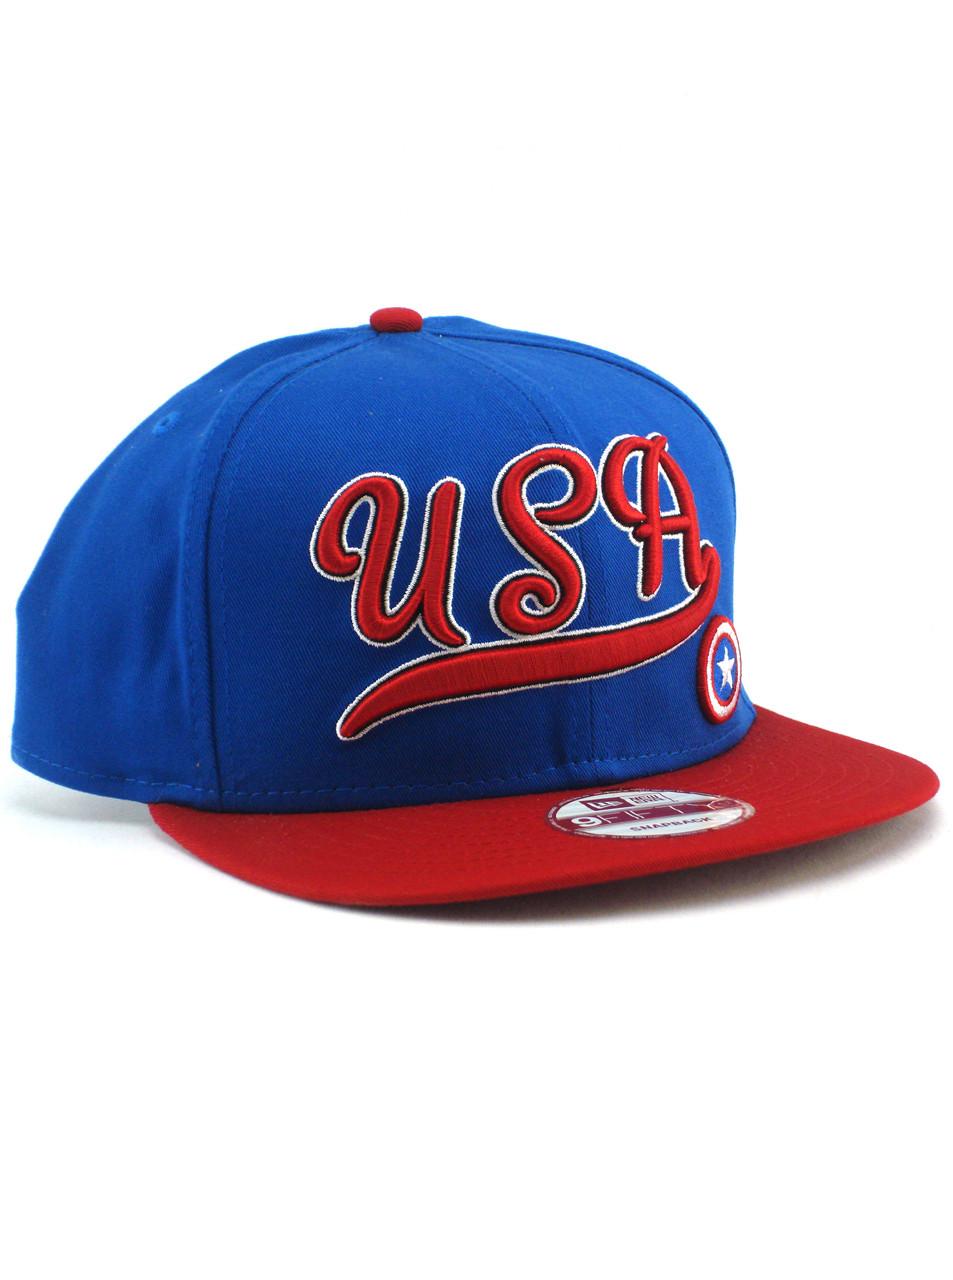 500486f811545 New Era USA Captain America 9fifty Snapback Hat View 1